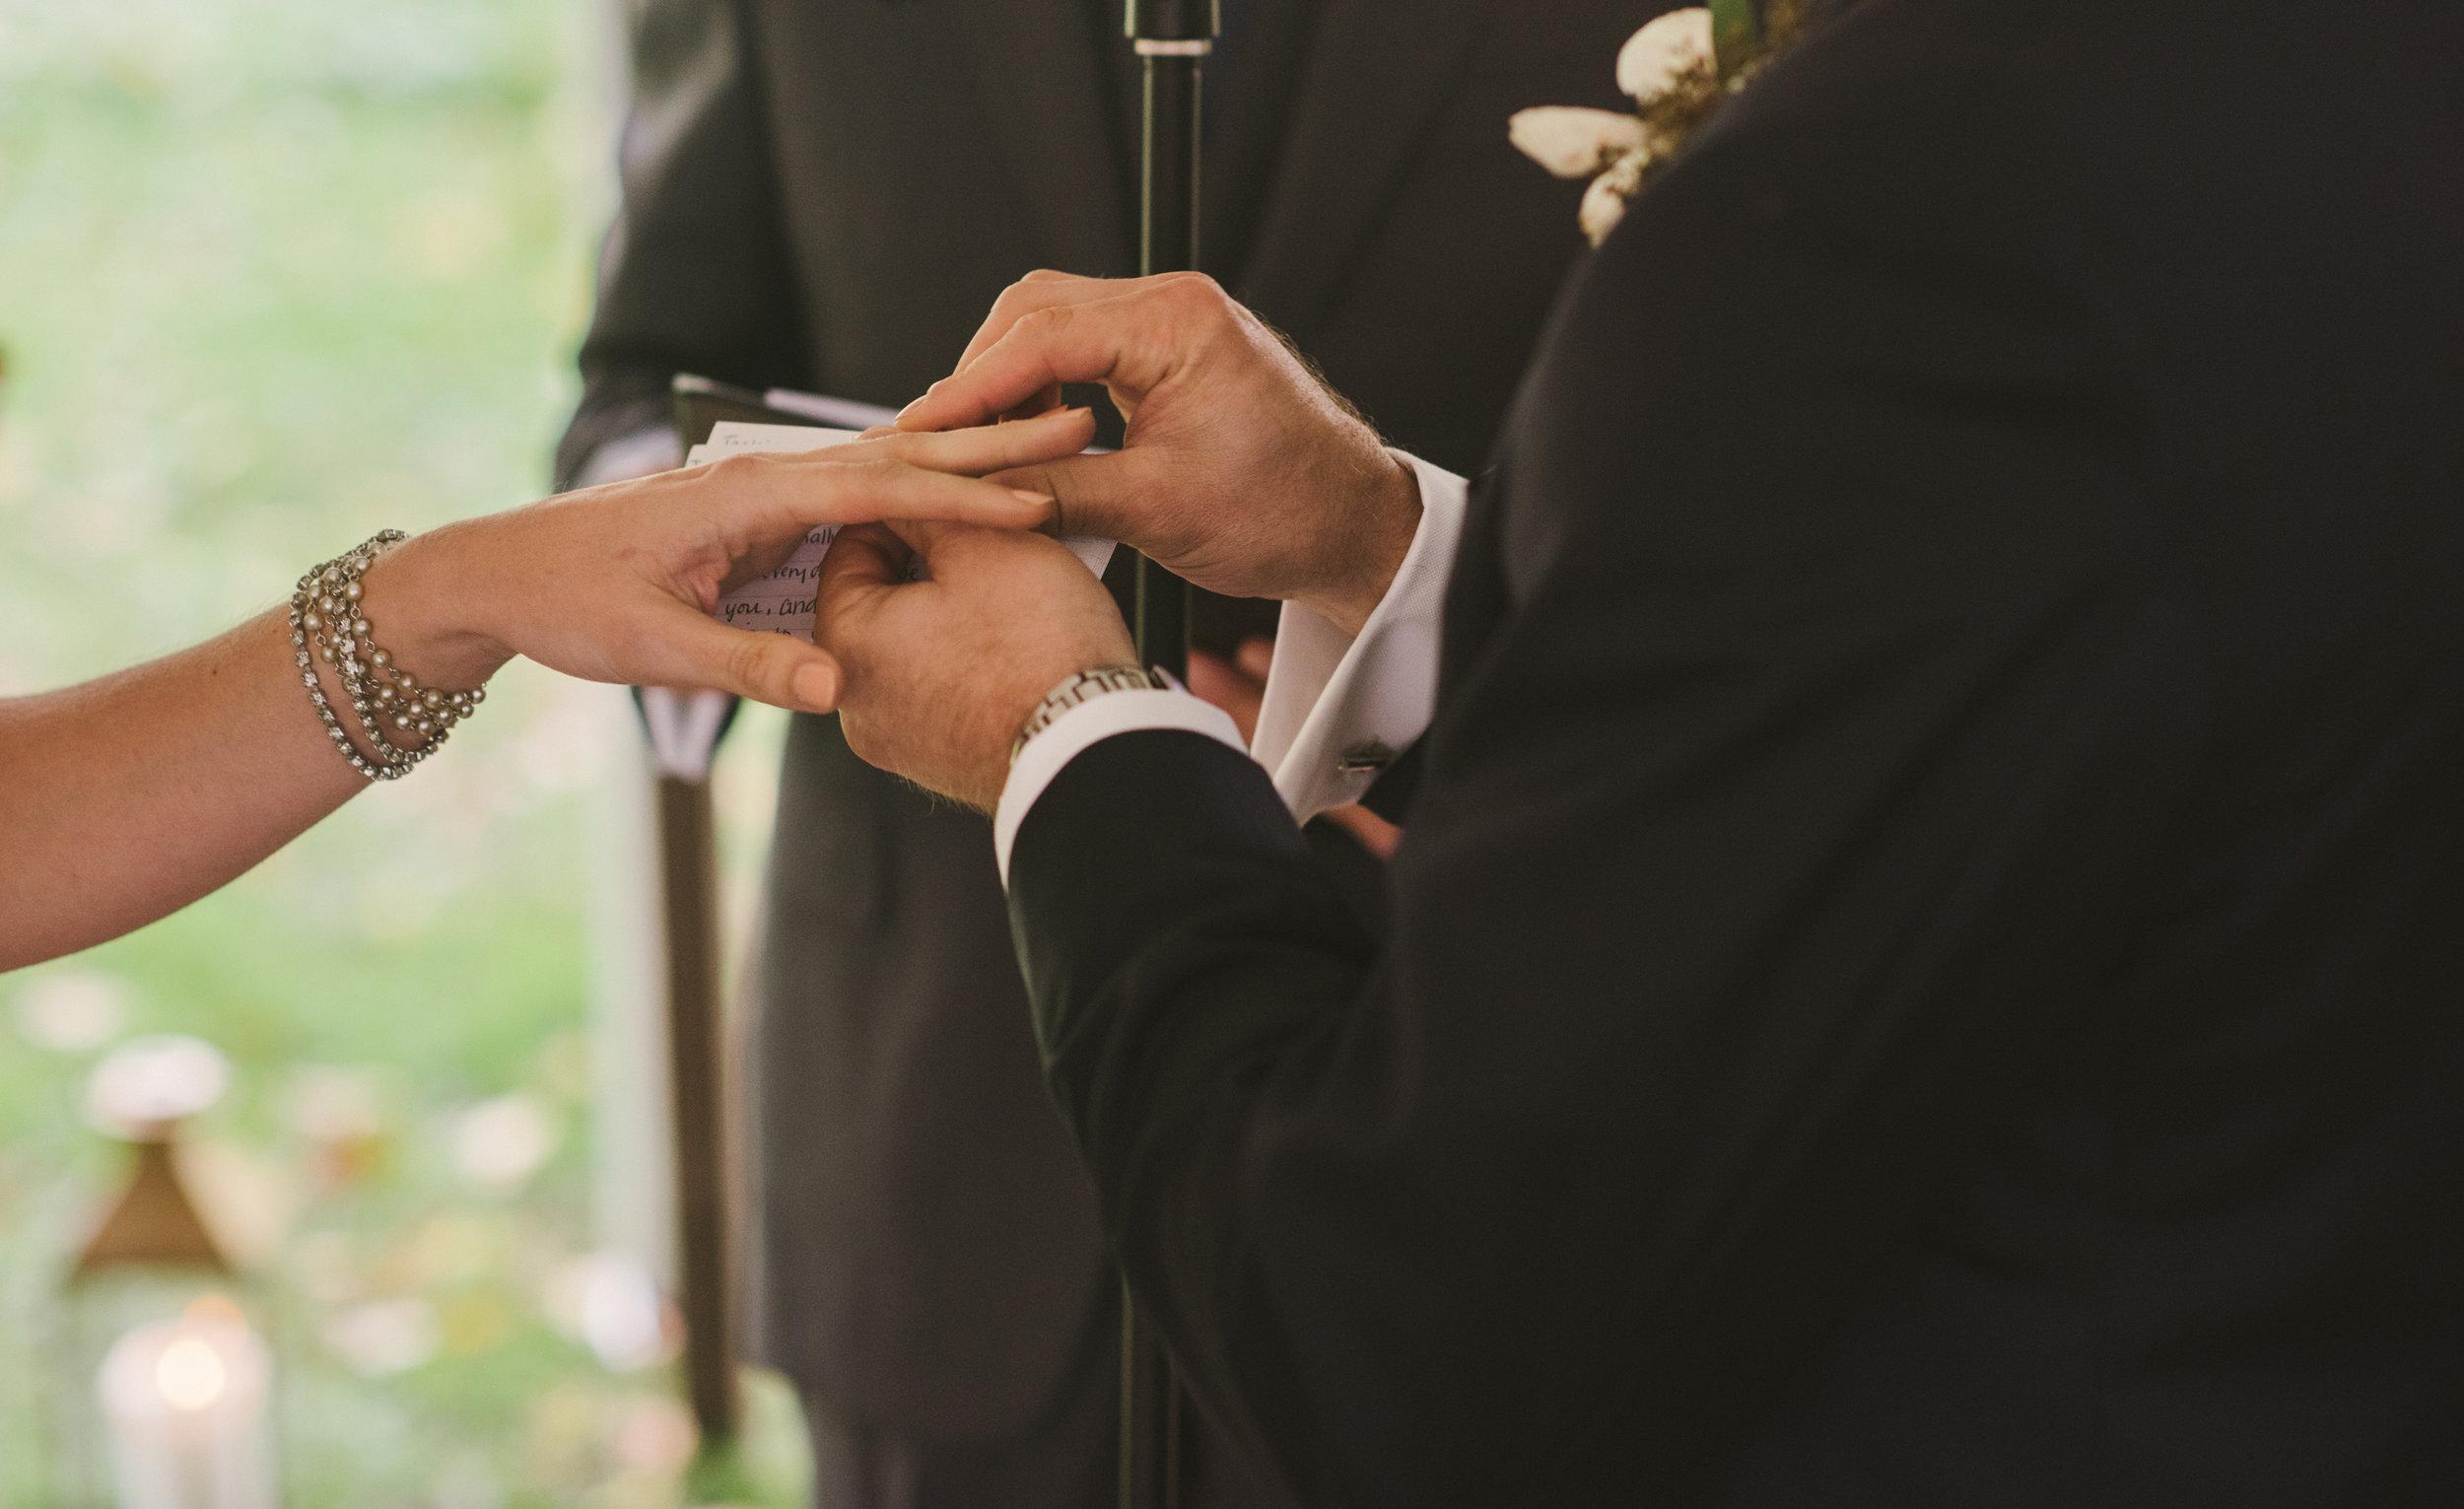 JACQUELINE & ANDREW WARSHAWER -BROOKMILL FARM FALL WEDDING - INTIMATE WEDDING PHOTOGRAPHER - TWOTWENTY by CHI-CHI AGBIM-270.jpg